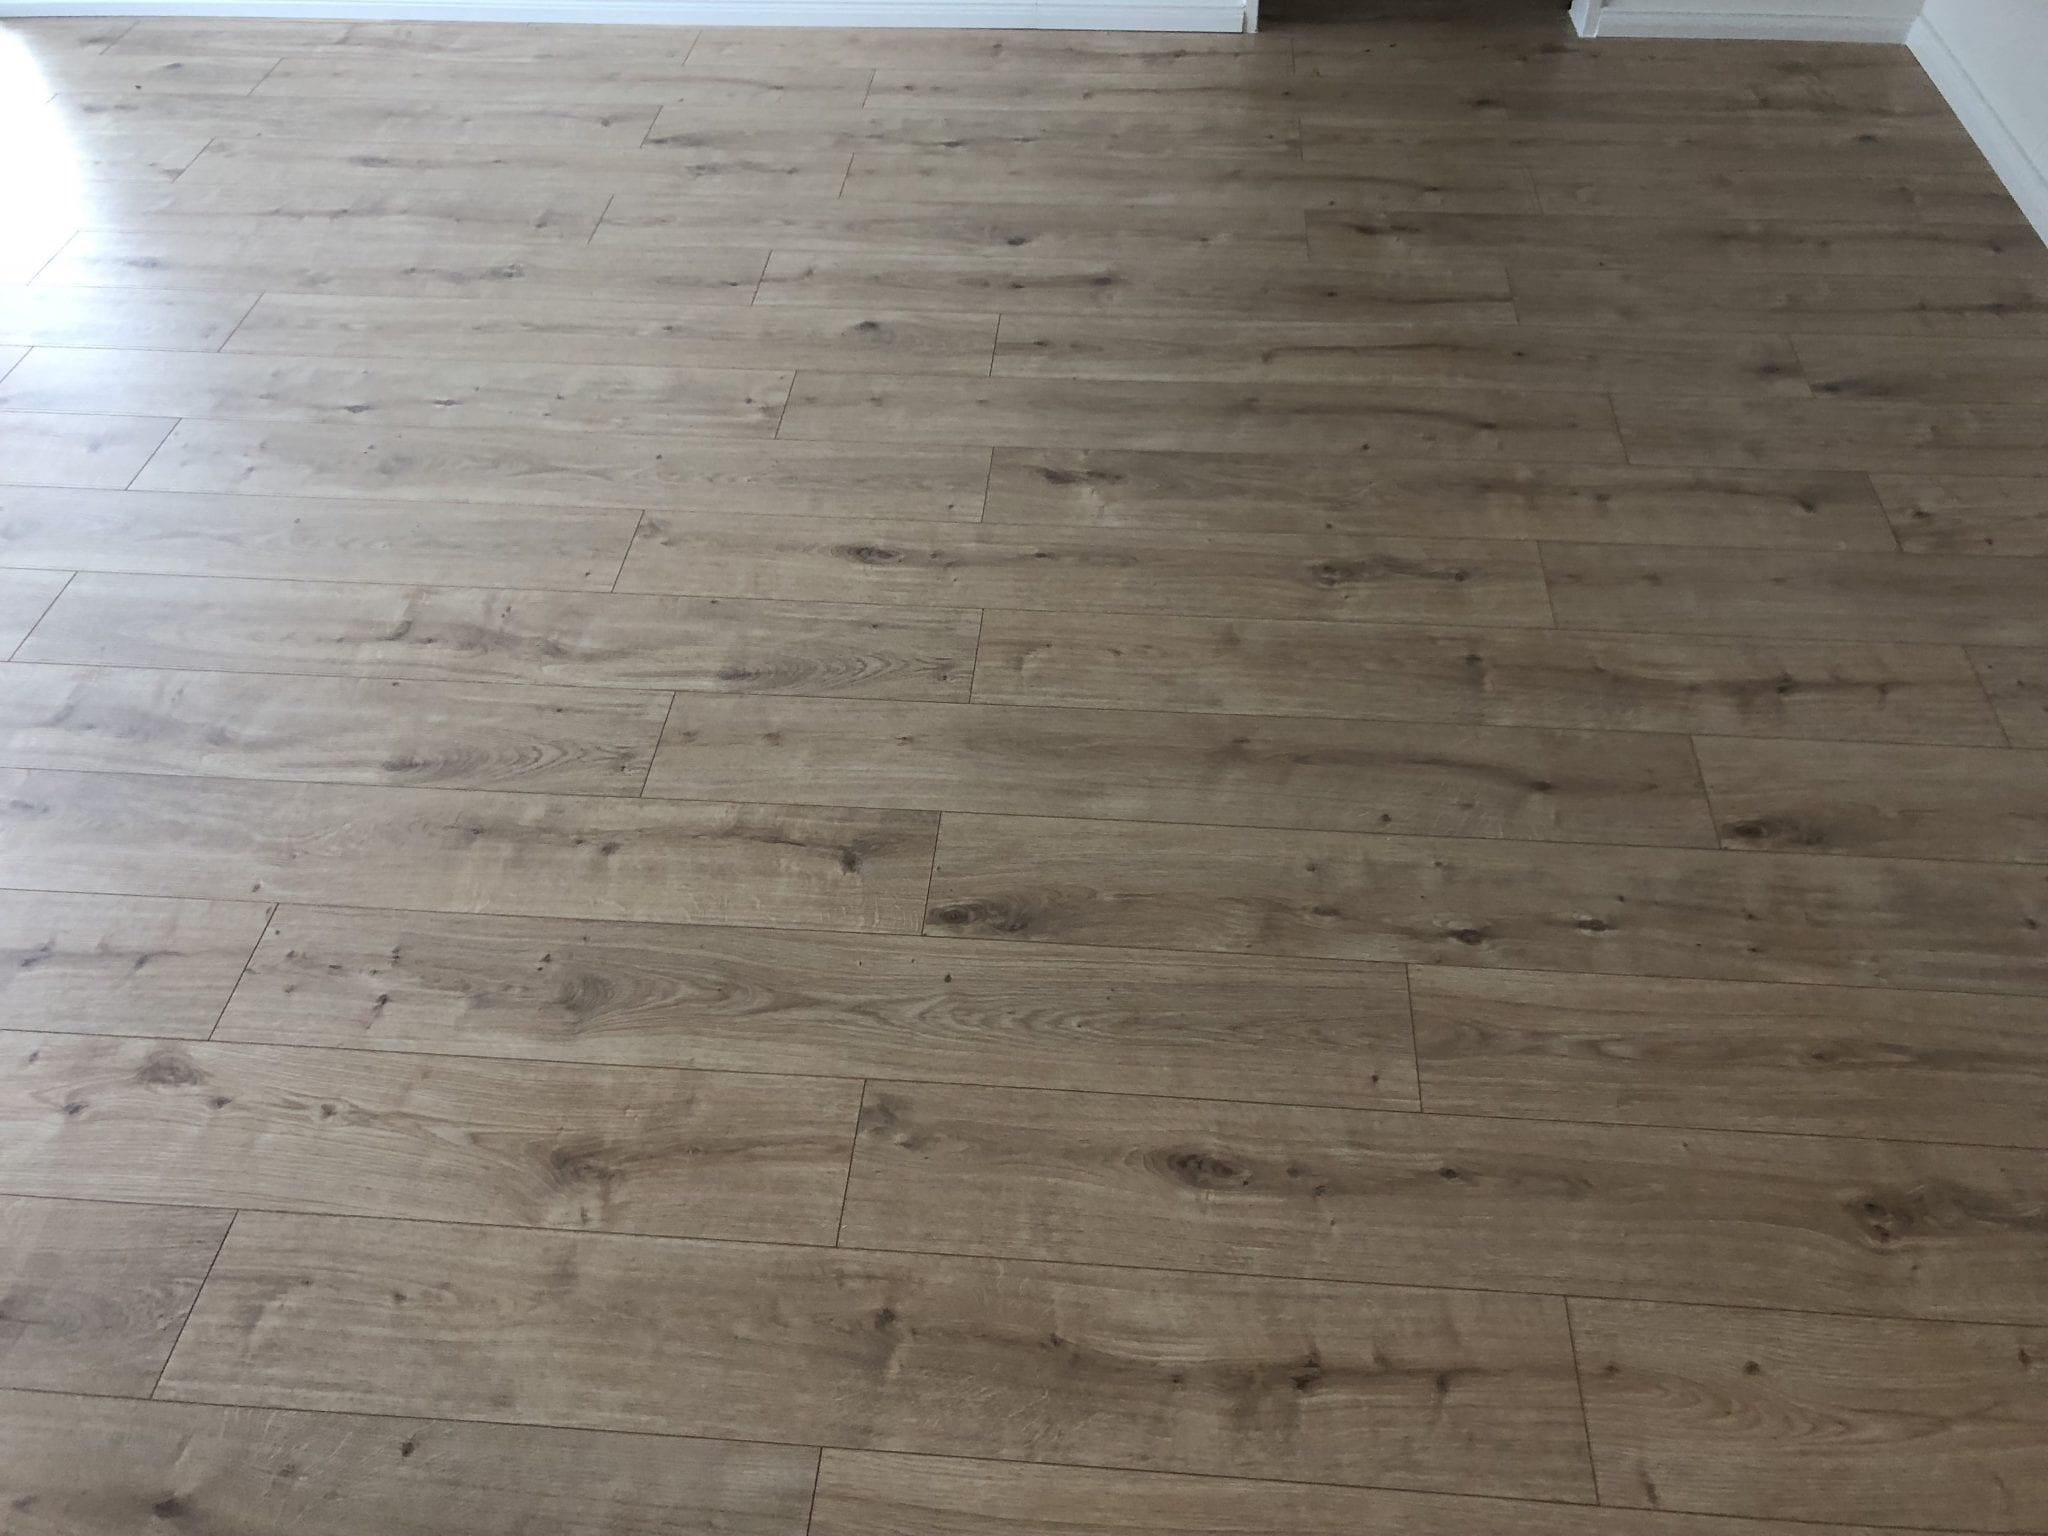 Fußboden Verlegen Kiel ~ Bodenlegerarbeiten bodenleger hamburg boden verlegen lassen jetzt